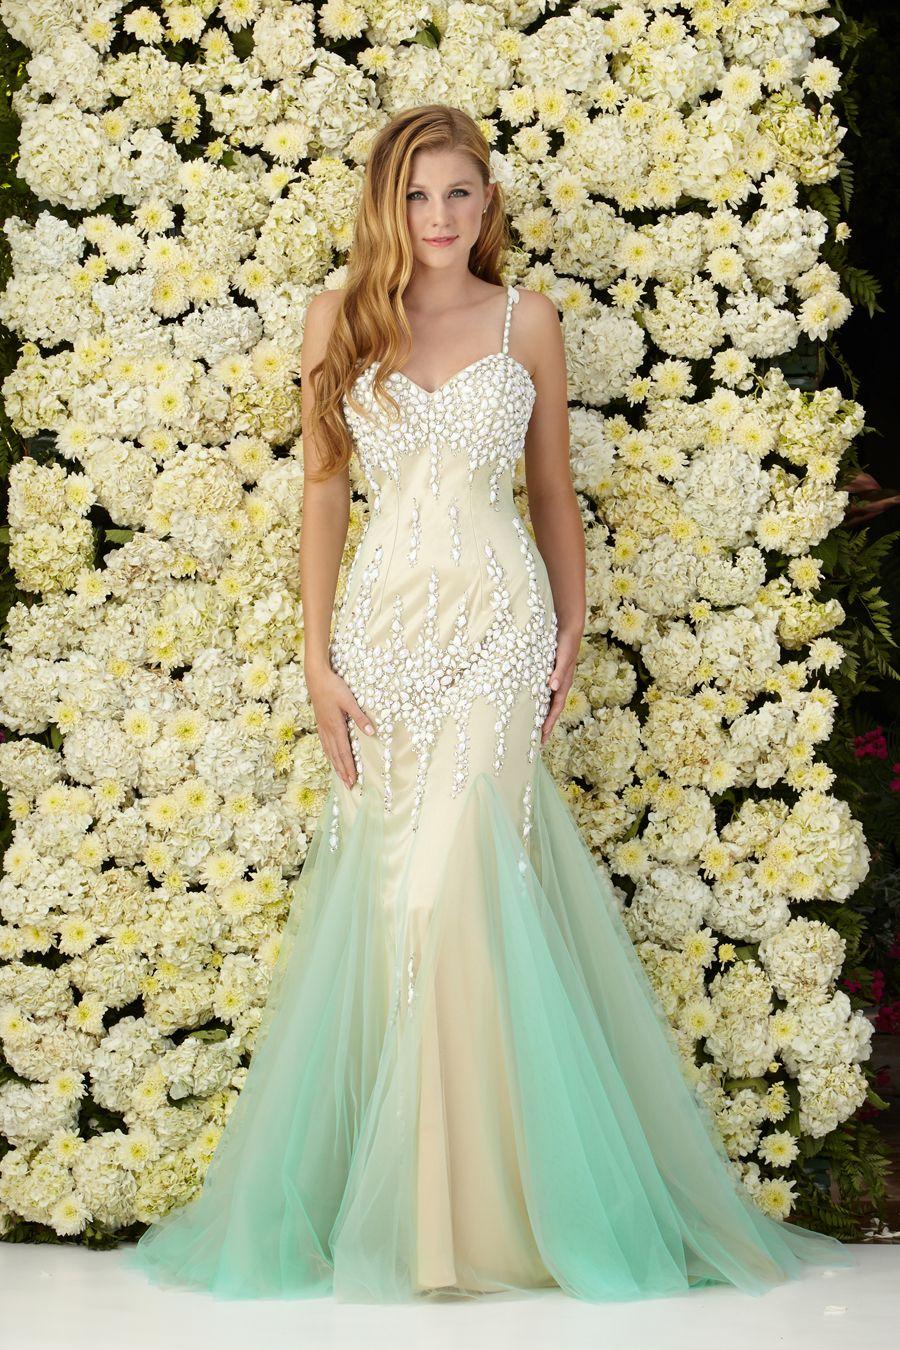 GLS APPAREL USA, INC - Dress Wholesale. GL2081 | Prom | Pinterest | Prom